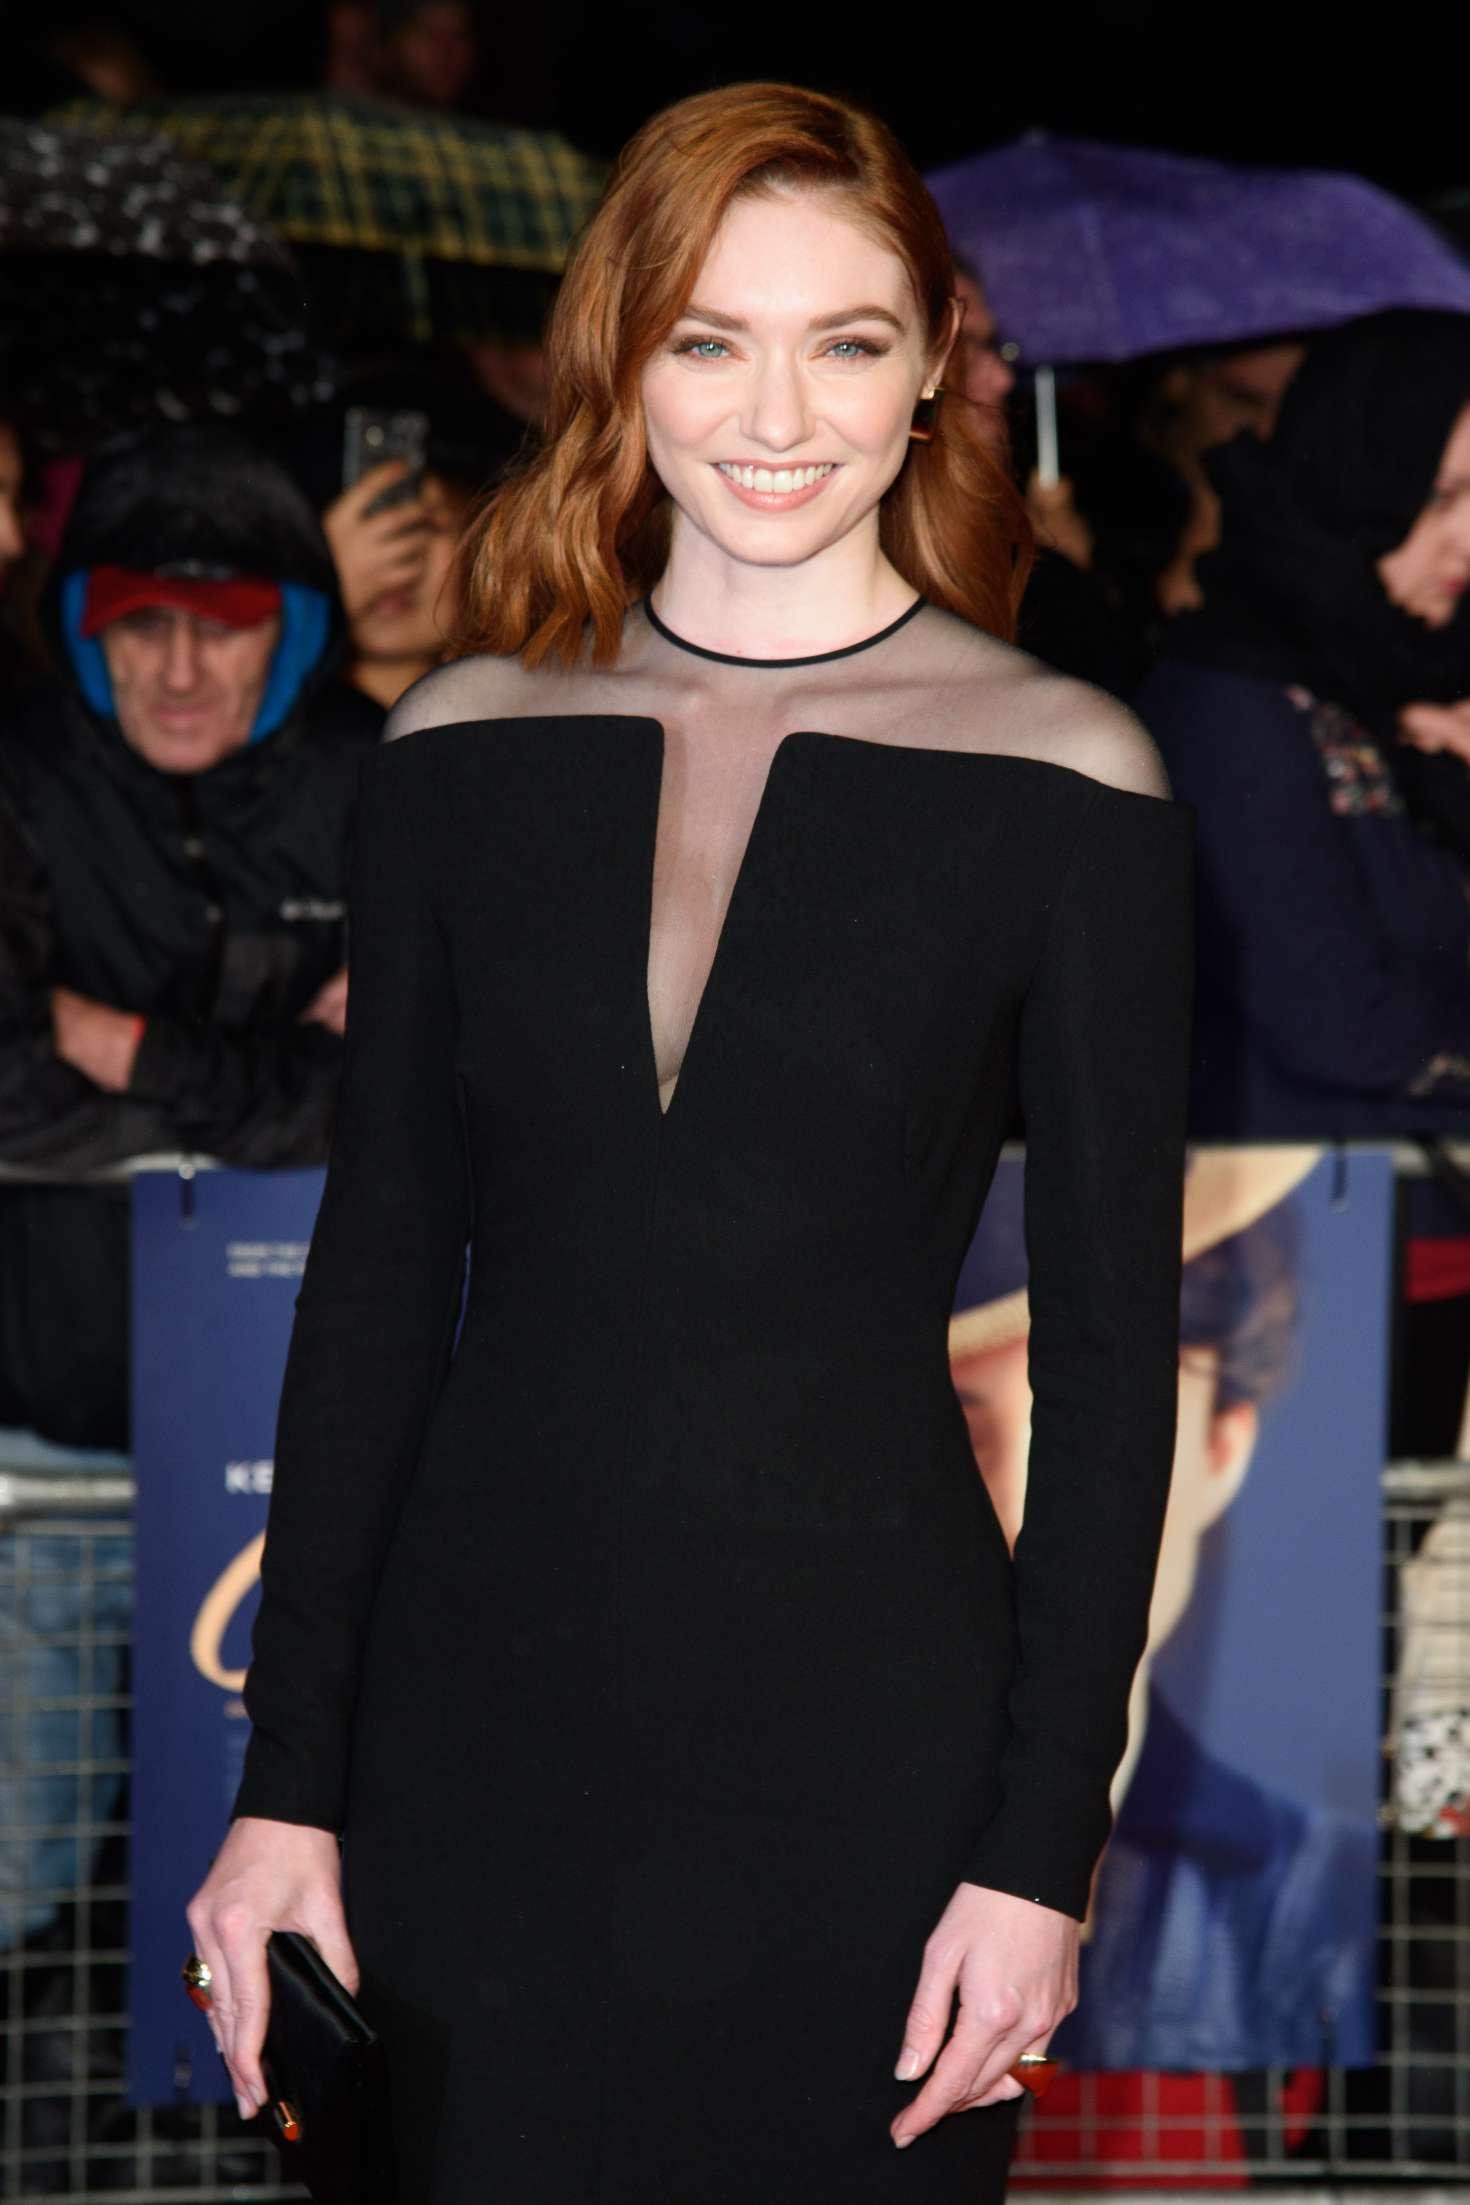 Eleanor Tomlinson - 'Colette' Premiere at 2018 BFI London Film Festival